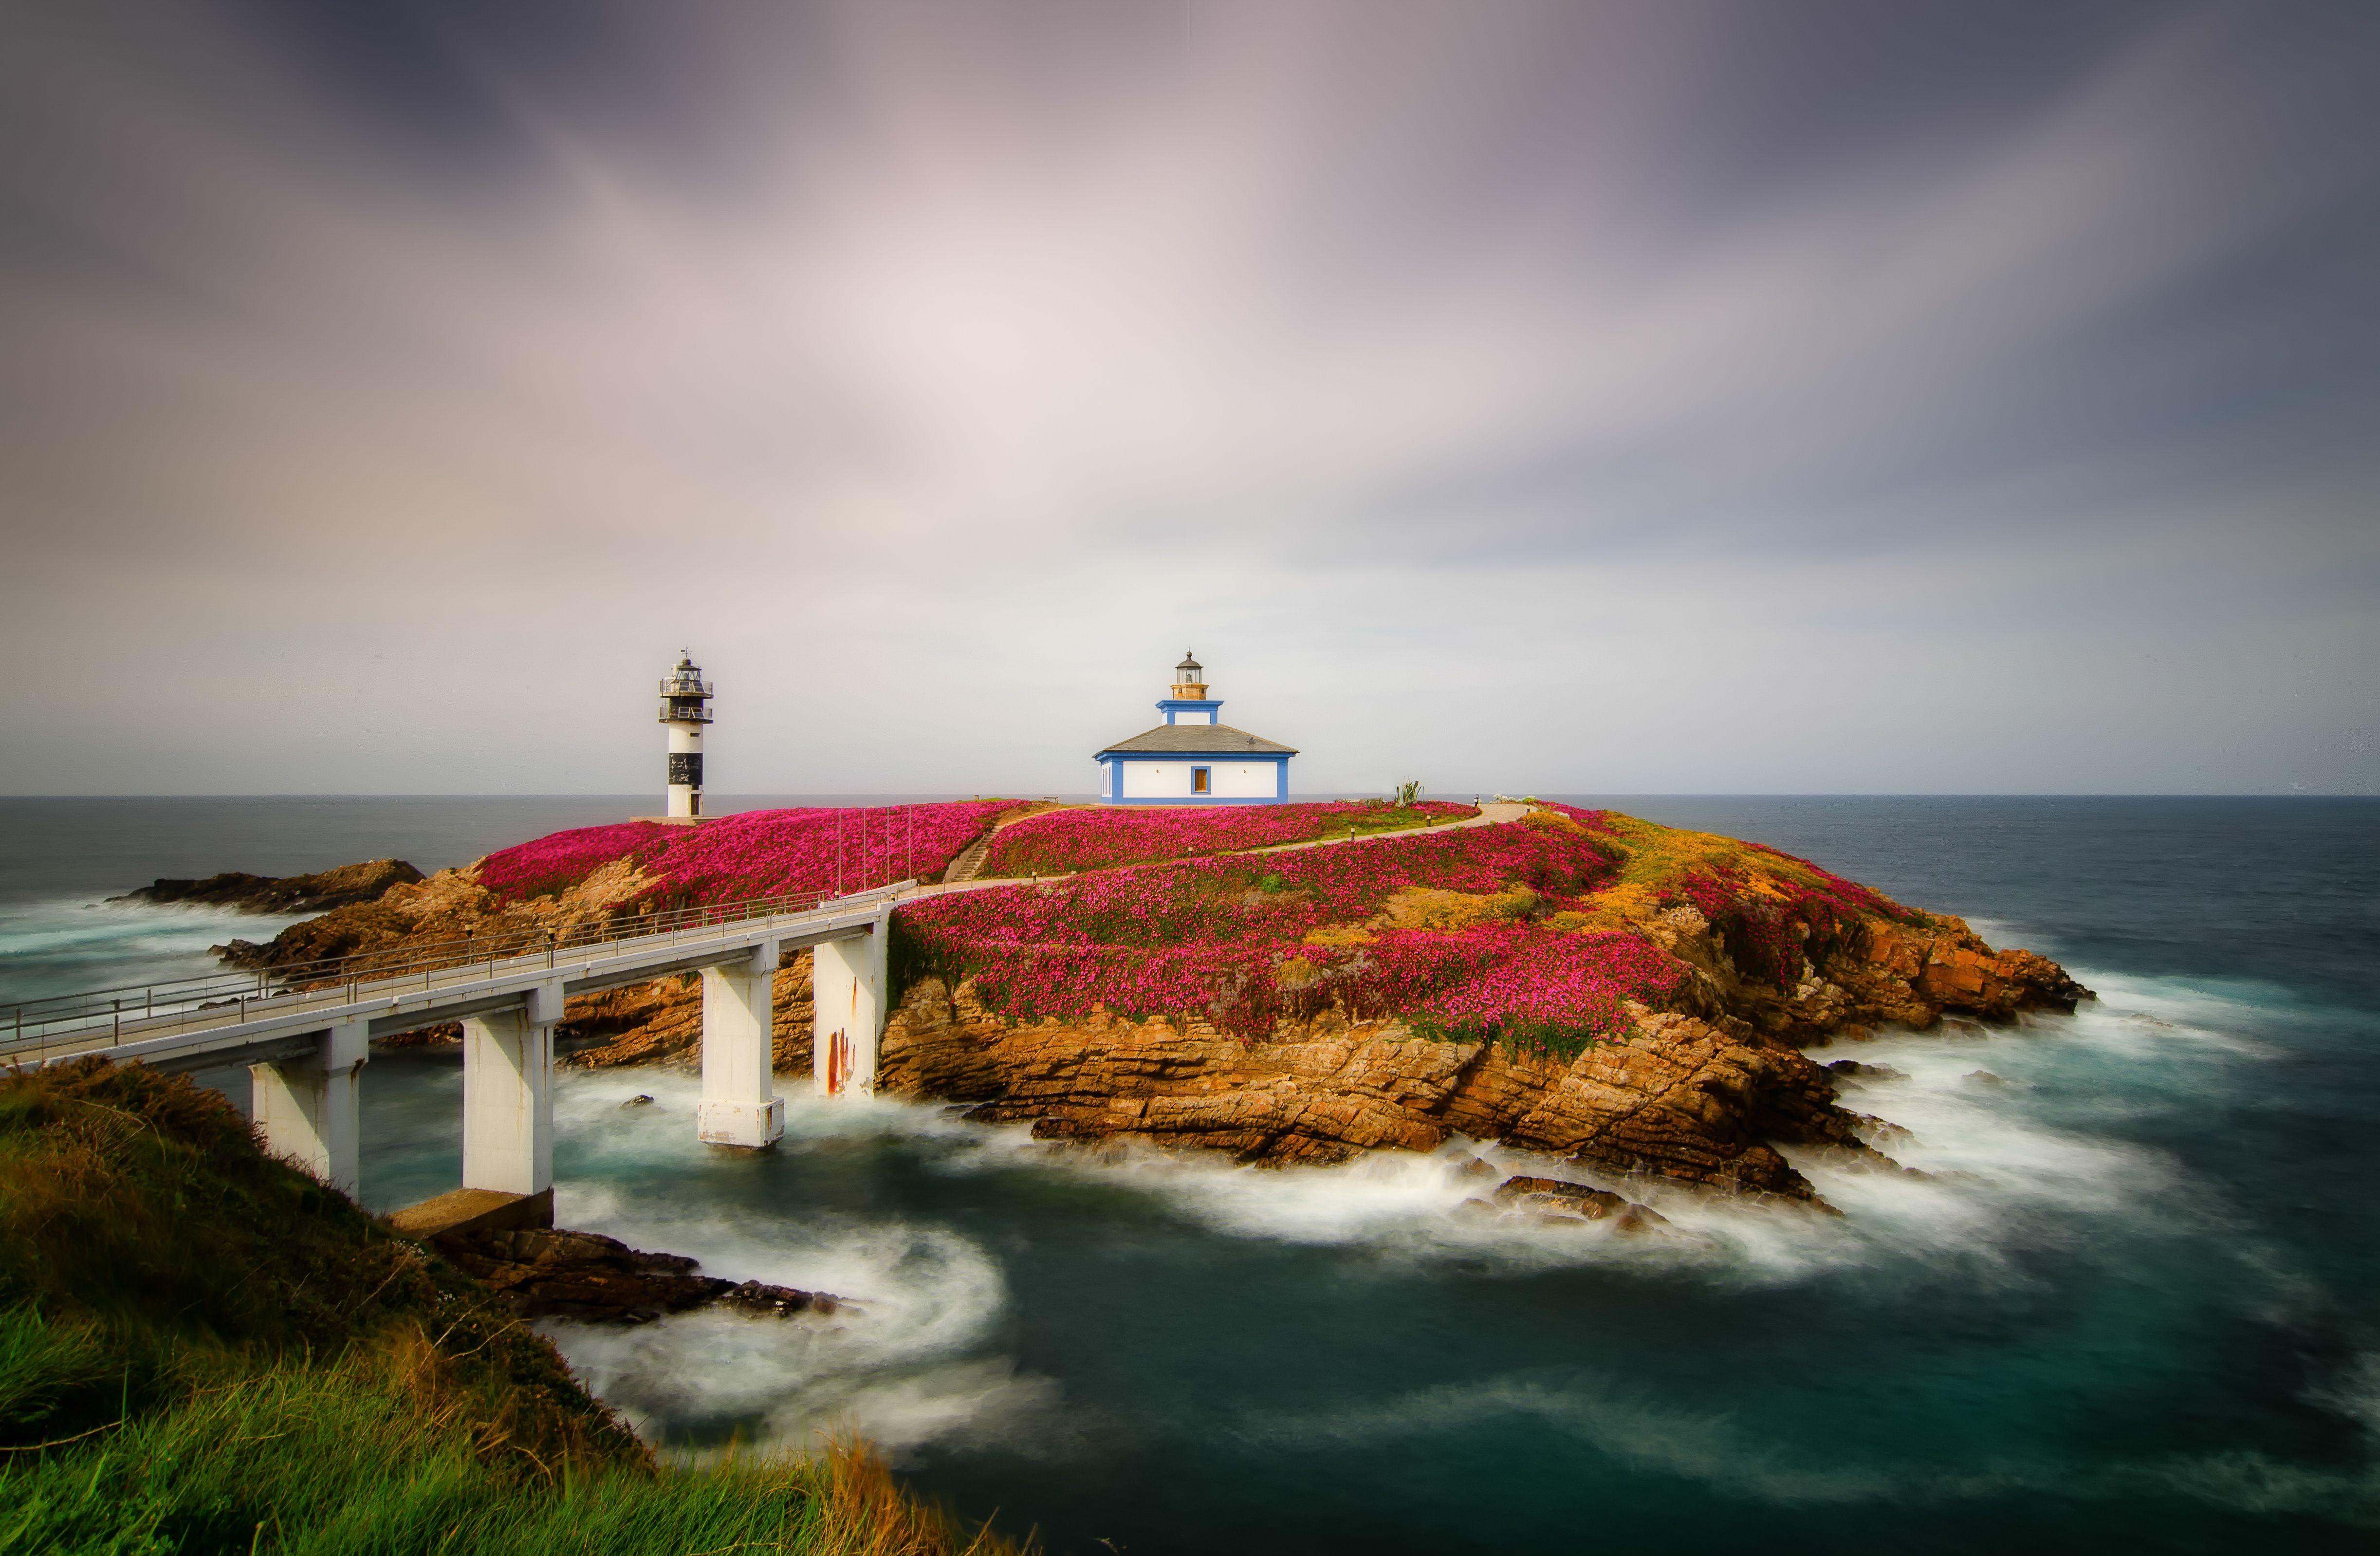 Обои Isla Pancha, Ribadeo, Испания, Атлантический океан